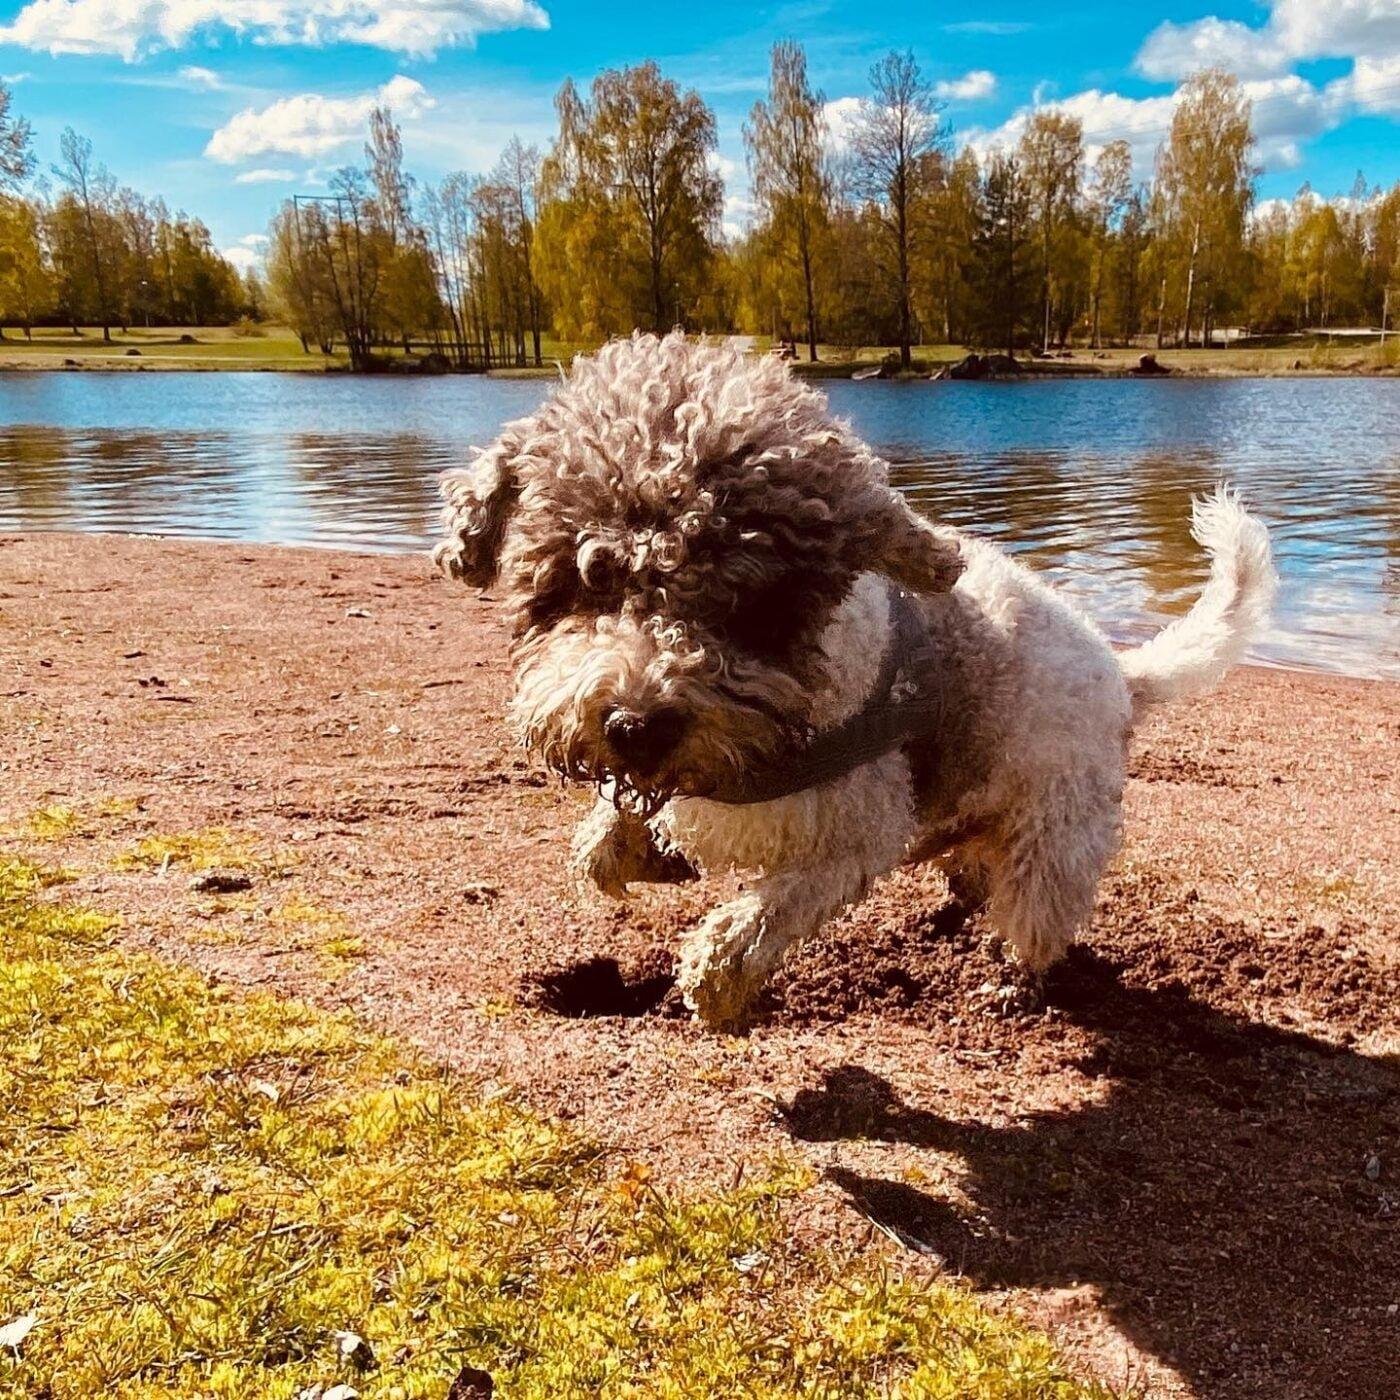 Attack! #lagottosofinstagram #lagottopuppy #italianwaterdog #truffledog #lagottoromagnolo_daily #happydoglife #Lagotto #Dogs #DogsOfInstagram #Petstagram #Pets #Dogstagram #MyLife #MyDailyLife #PappaJagVillHaEnItalienare #MacLagotto #Falun #Sweden #FF #l4l #instafollow @knappare @liminglindblad @k.rowntree @taxen_coco @h3lvetesjavlar This was posted by my Dad: @kristerlindholmfalun